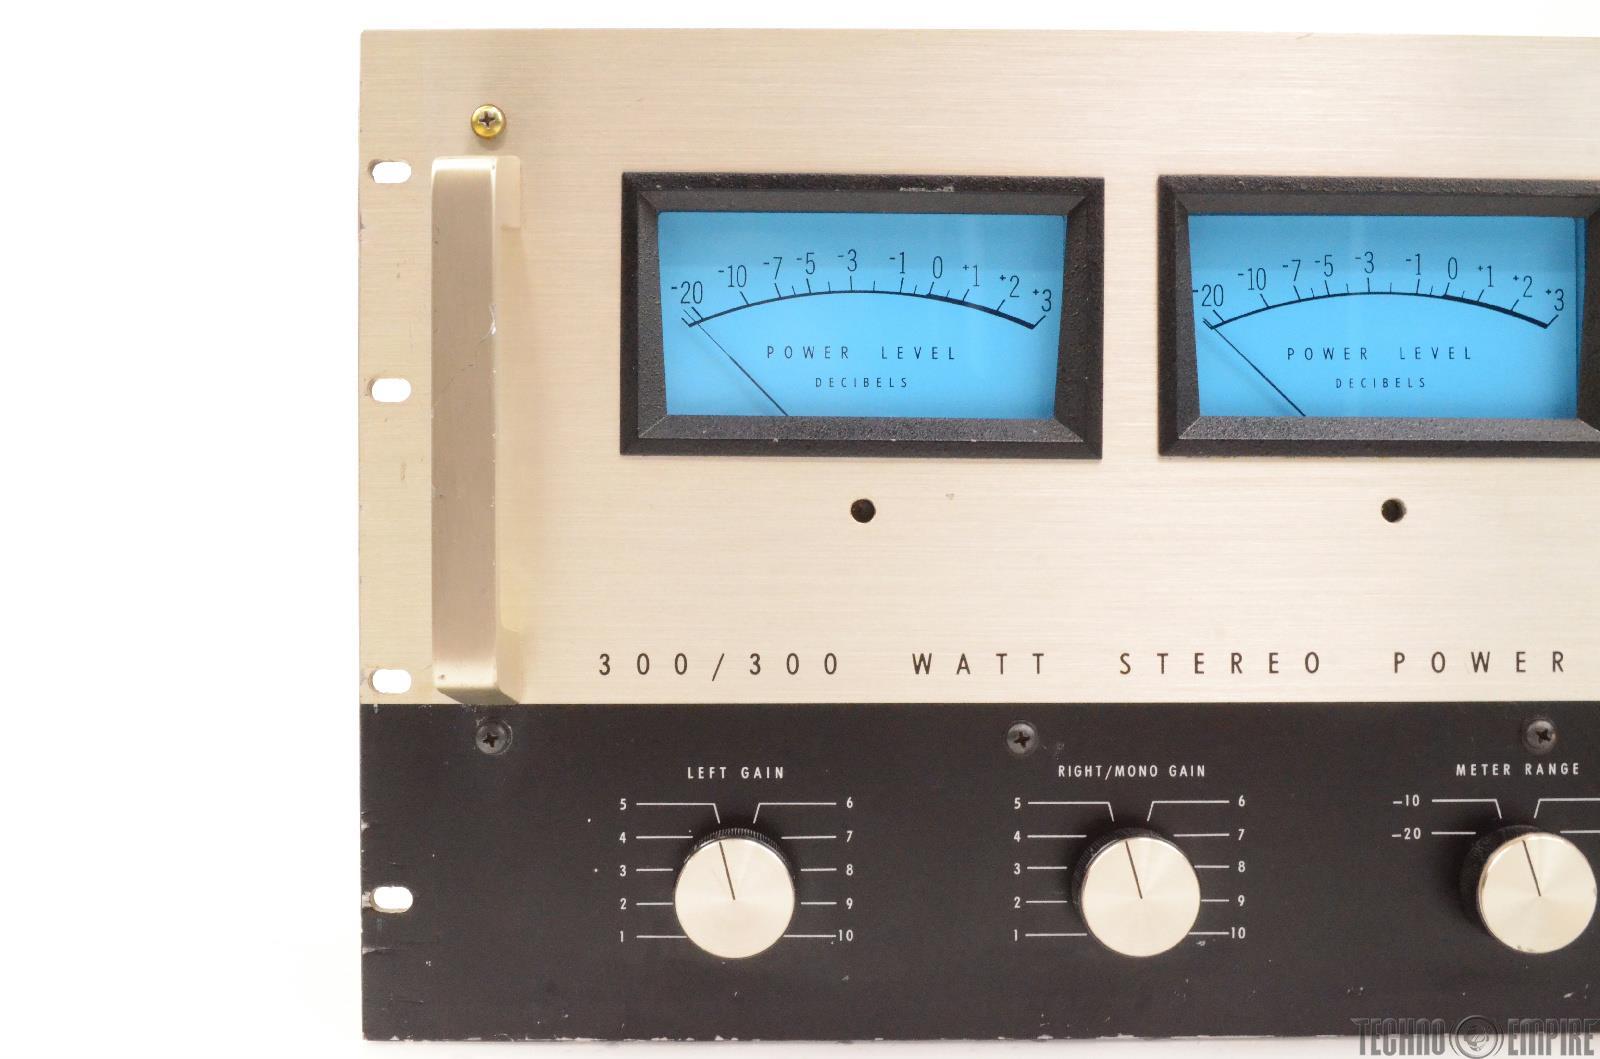 Stereo Amplifier Vu Meter For Power Amplifiers